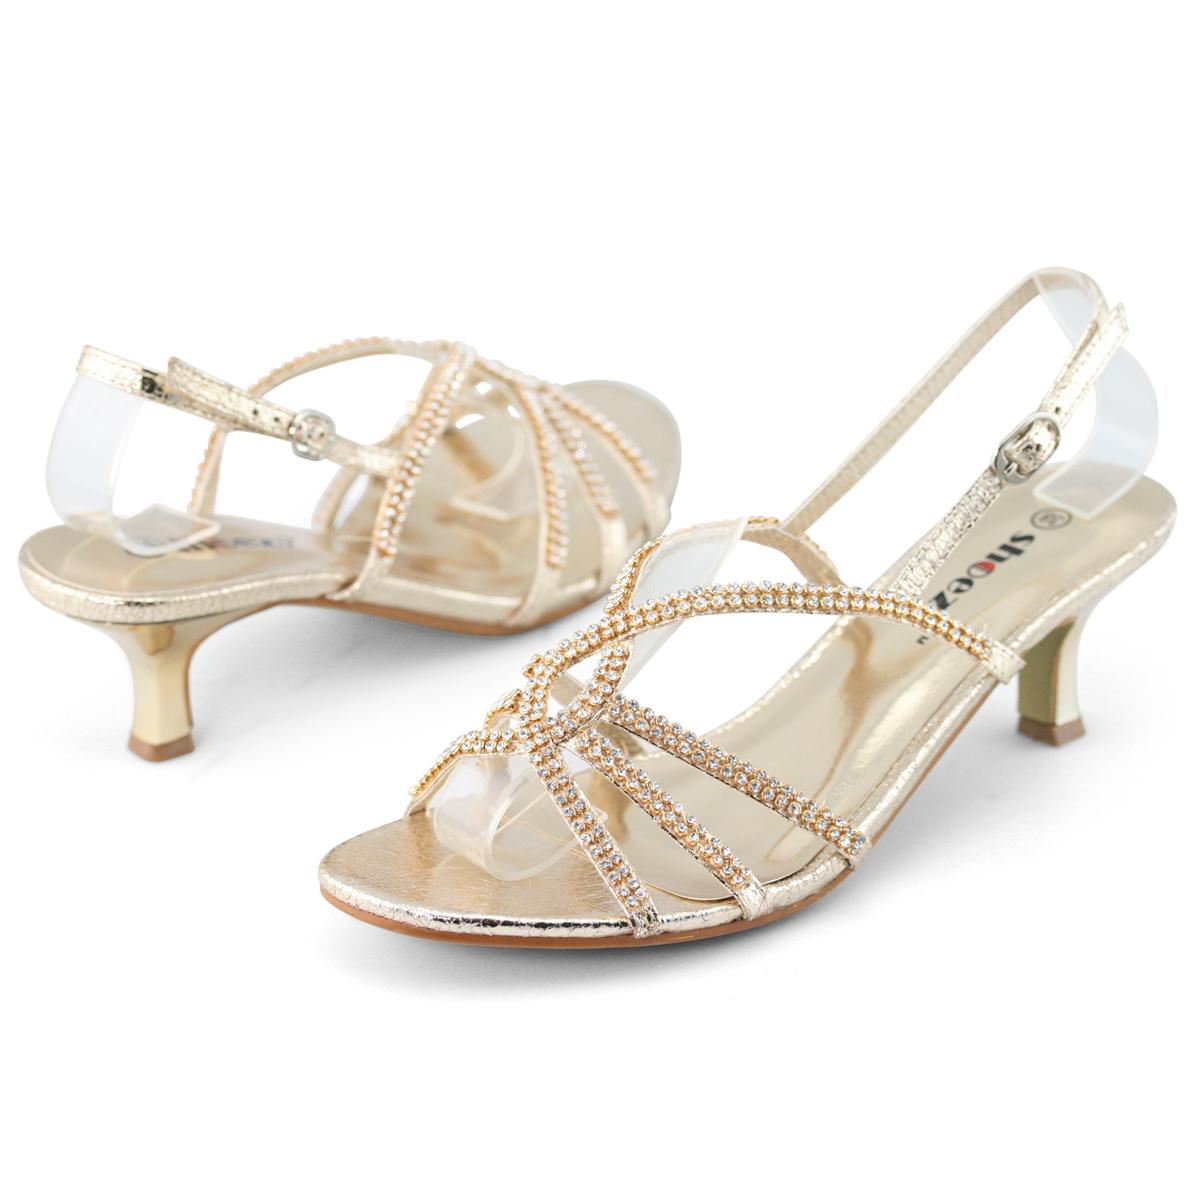 on feet images of best quality brand new Kitten Heel Sandals   CraftySandals.com